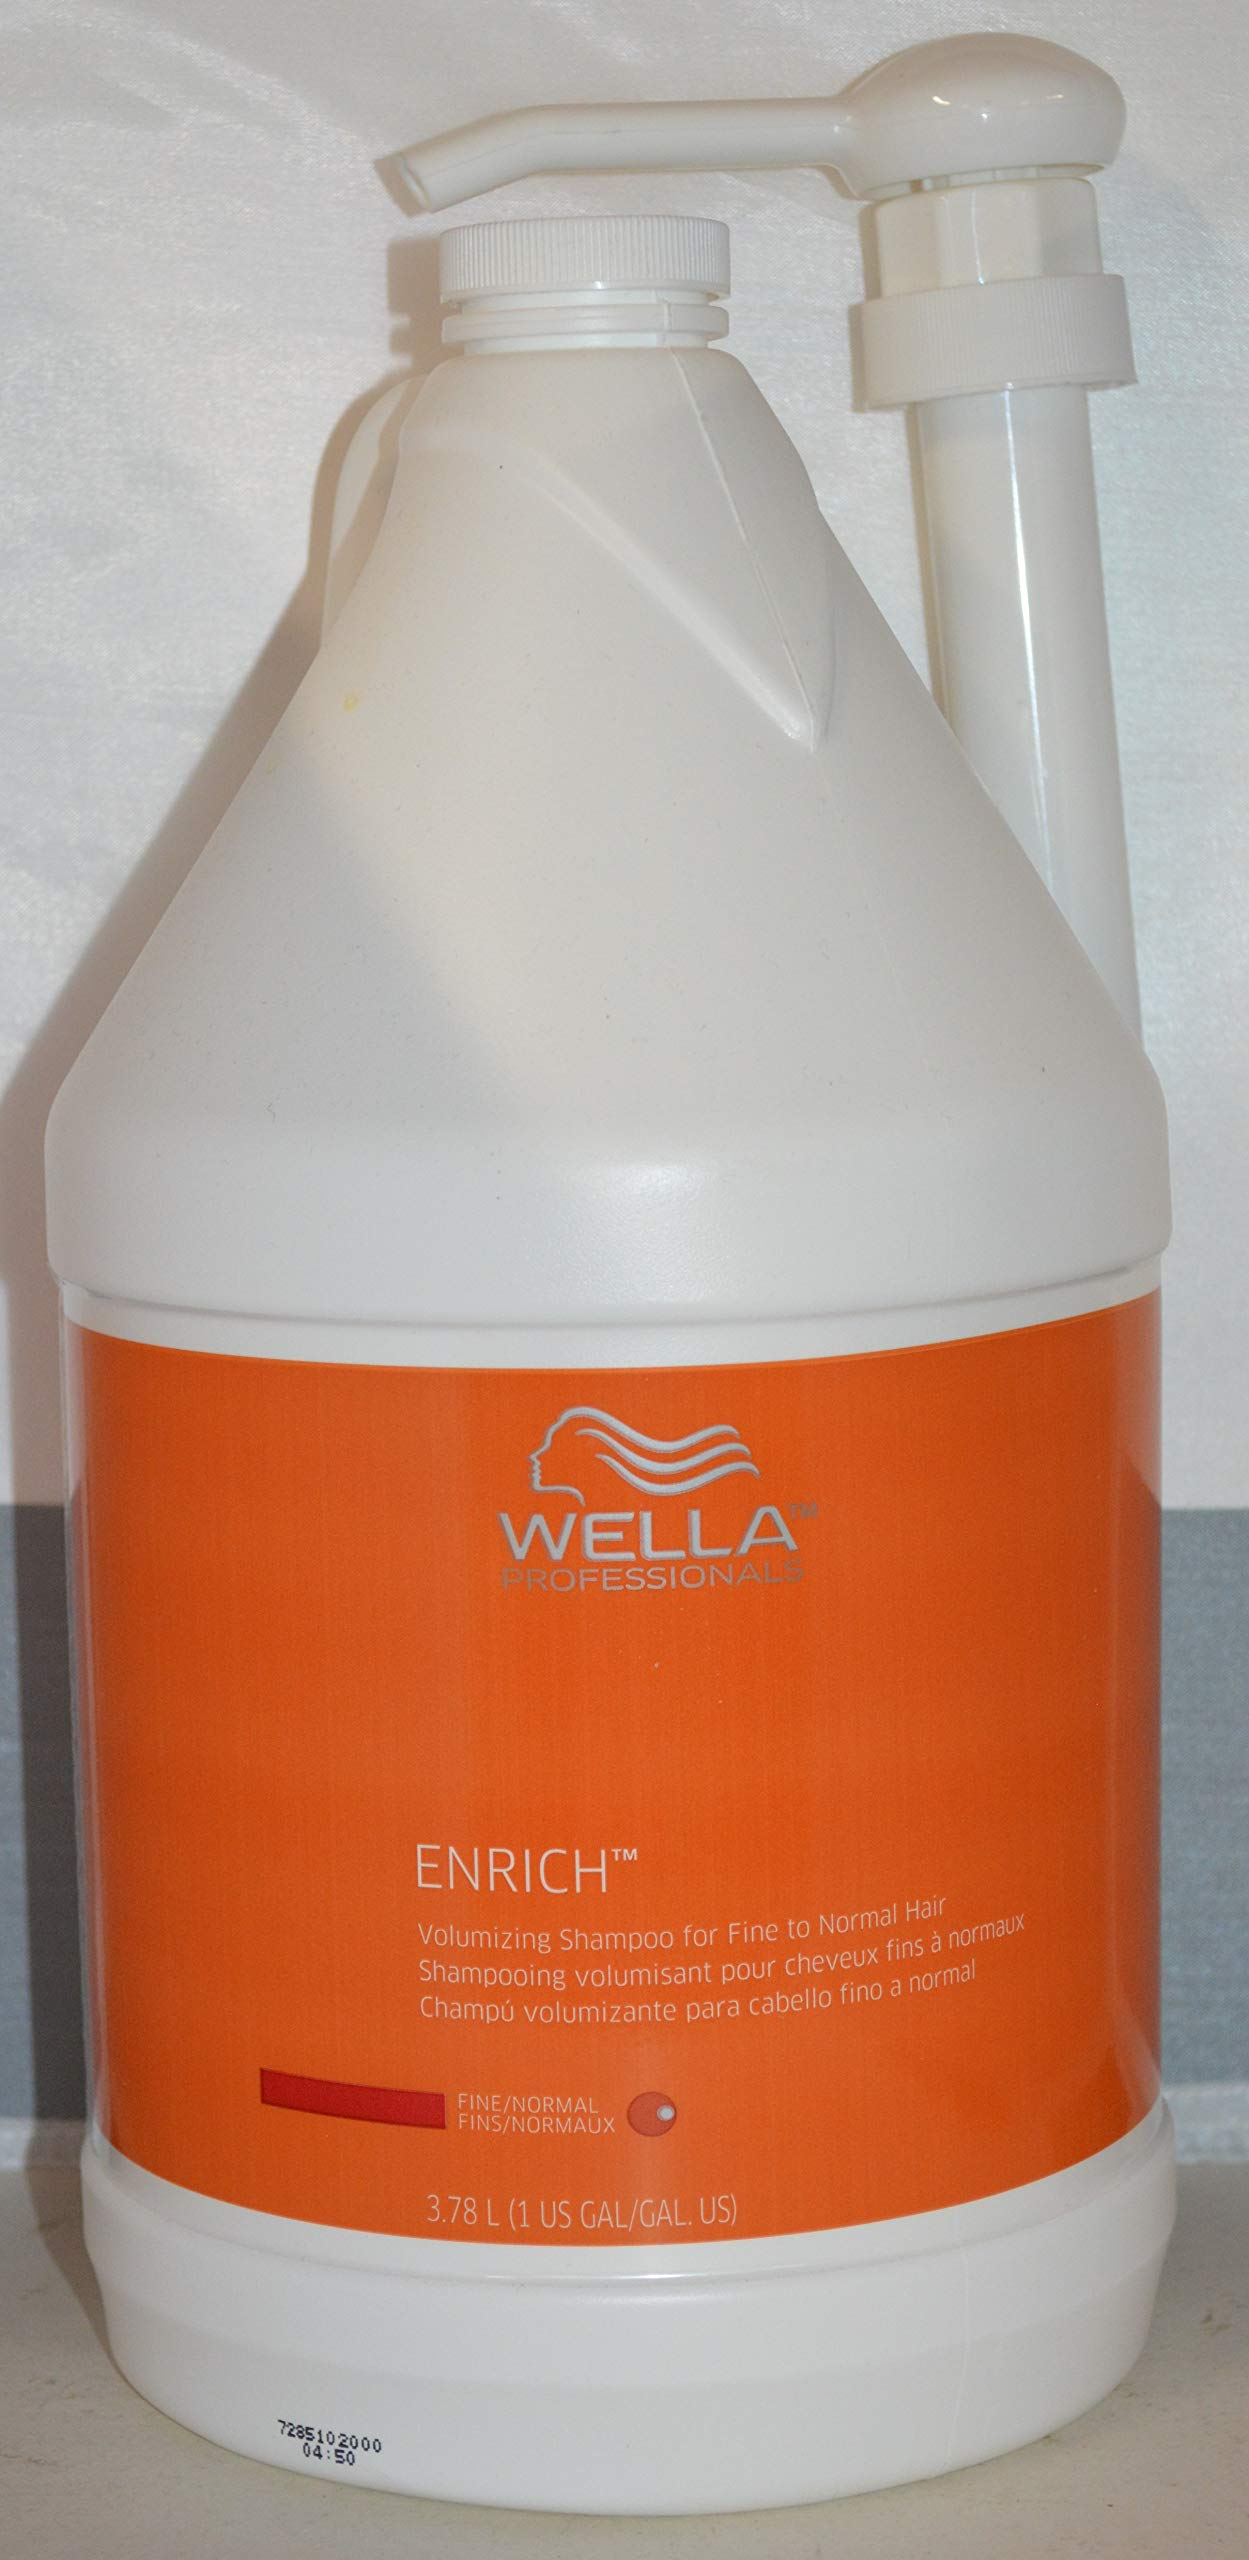 Wella Enrich Volumizing Shampoo for Fine to Normal Hair Gallon/128oz Includes Pump by Wella